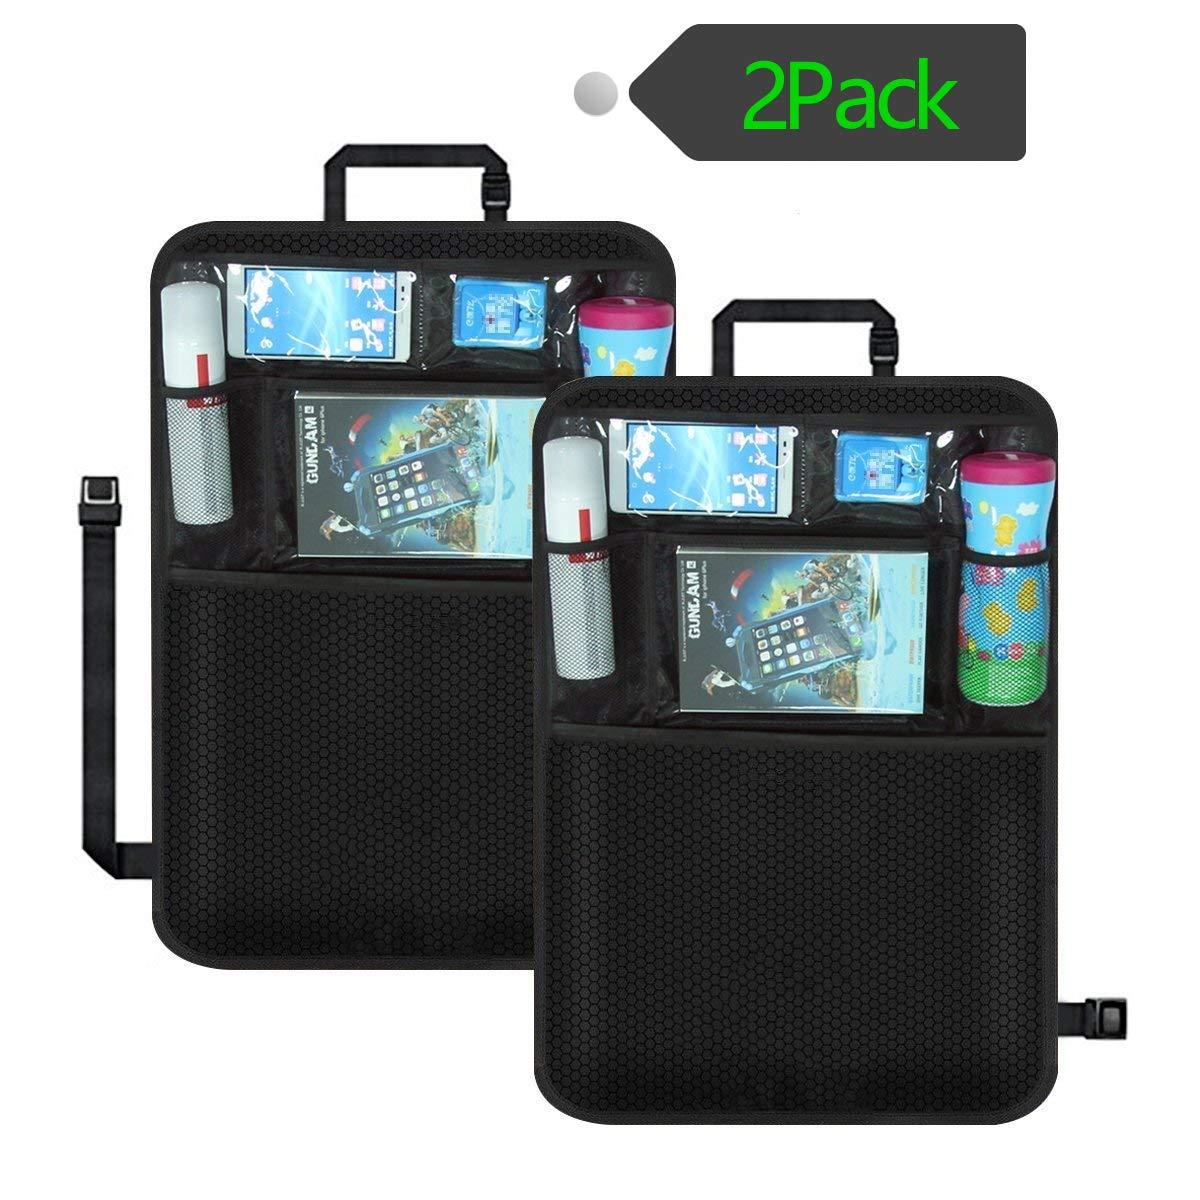 2 Pack Kick Mats Car Back Seat Protector Waterproof Seat Back Cover with Tablet Holder by UMJWYJ by UMJWYJ